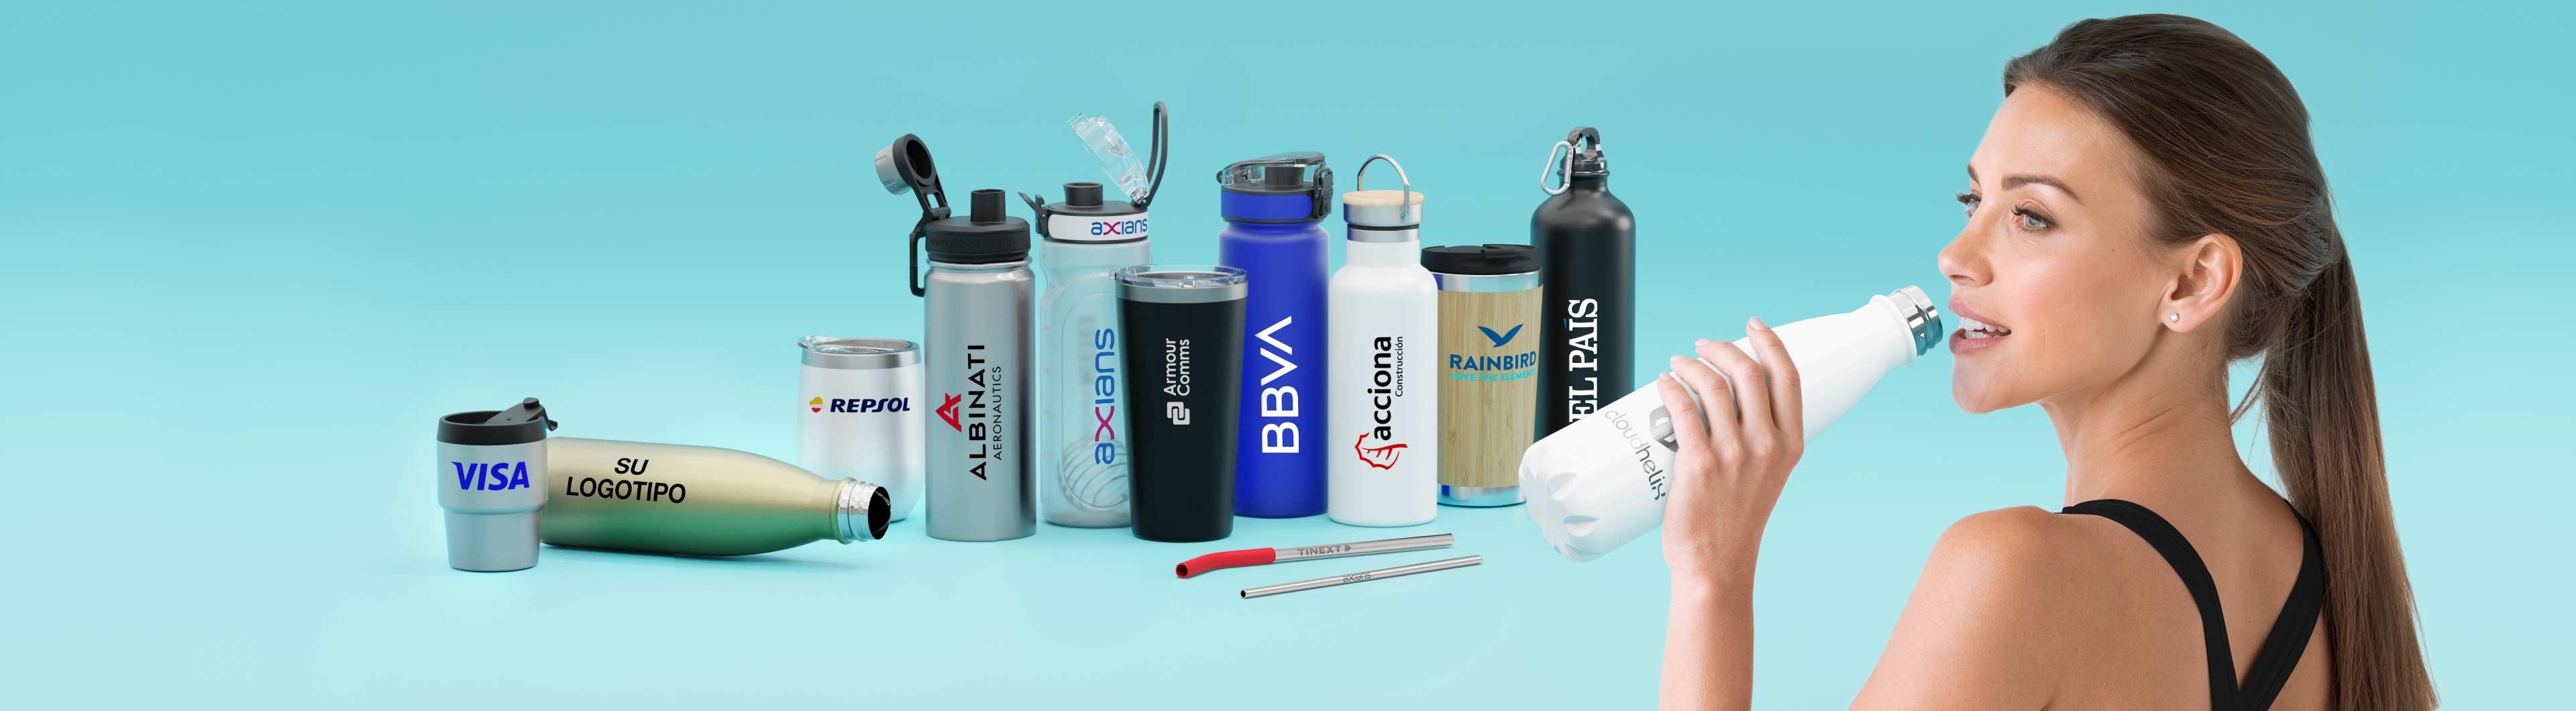 Flasky - Botellas de agua personalizadas